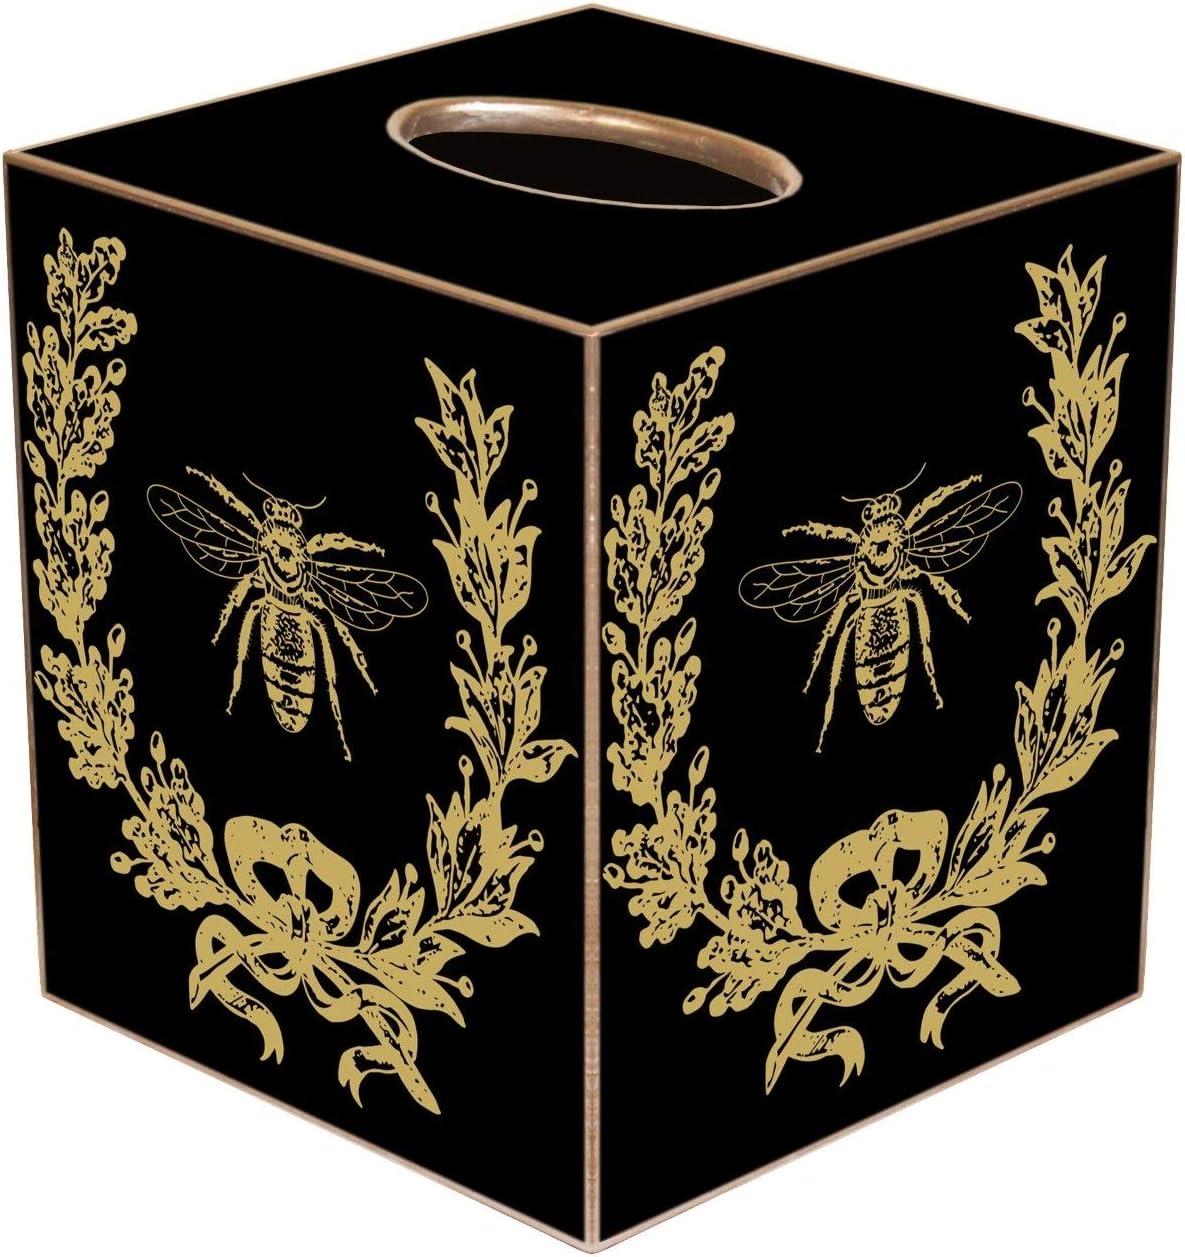 "Tissue Box Cover French Country Decor French Bee Decorations Tissue Holder Bedroom Decor Bathroom Decor Desk Decor Gold Black 5"" x 5"""